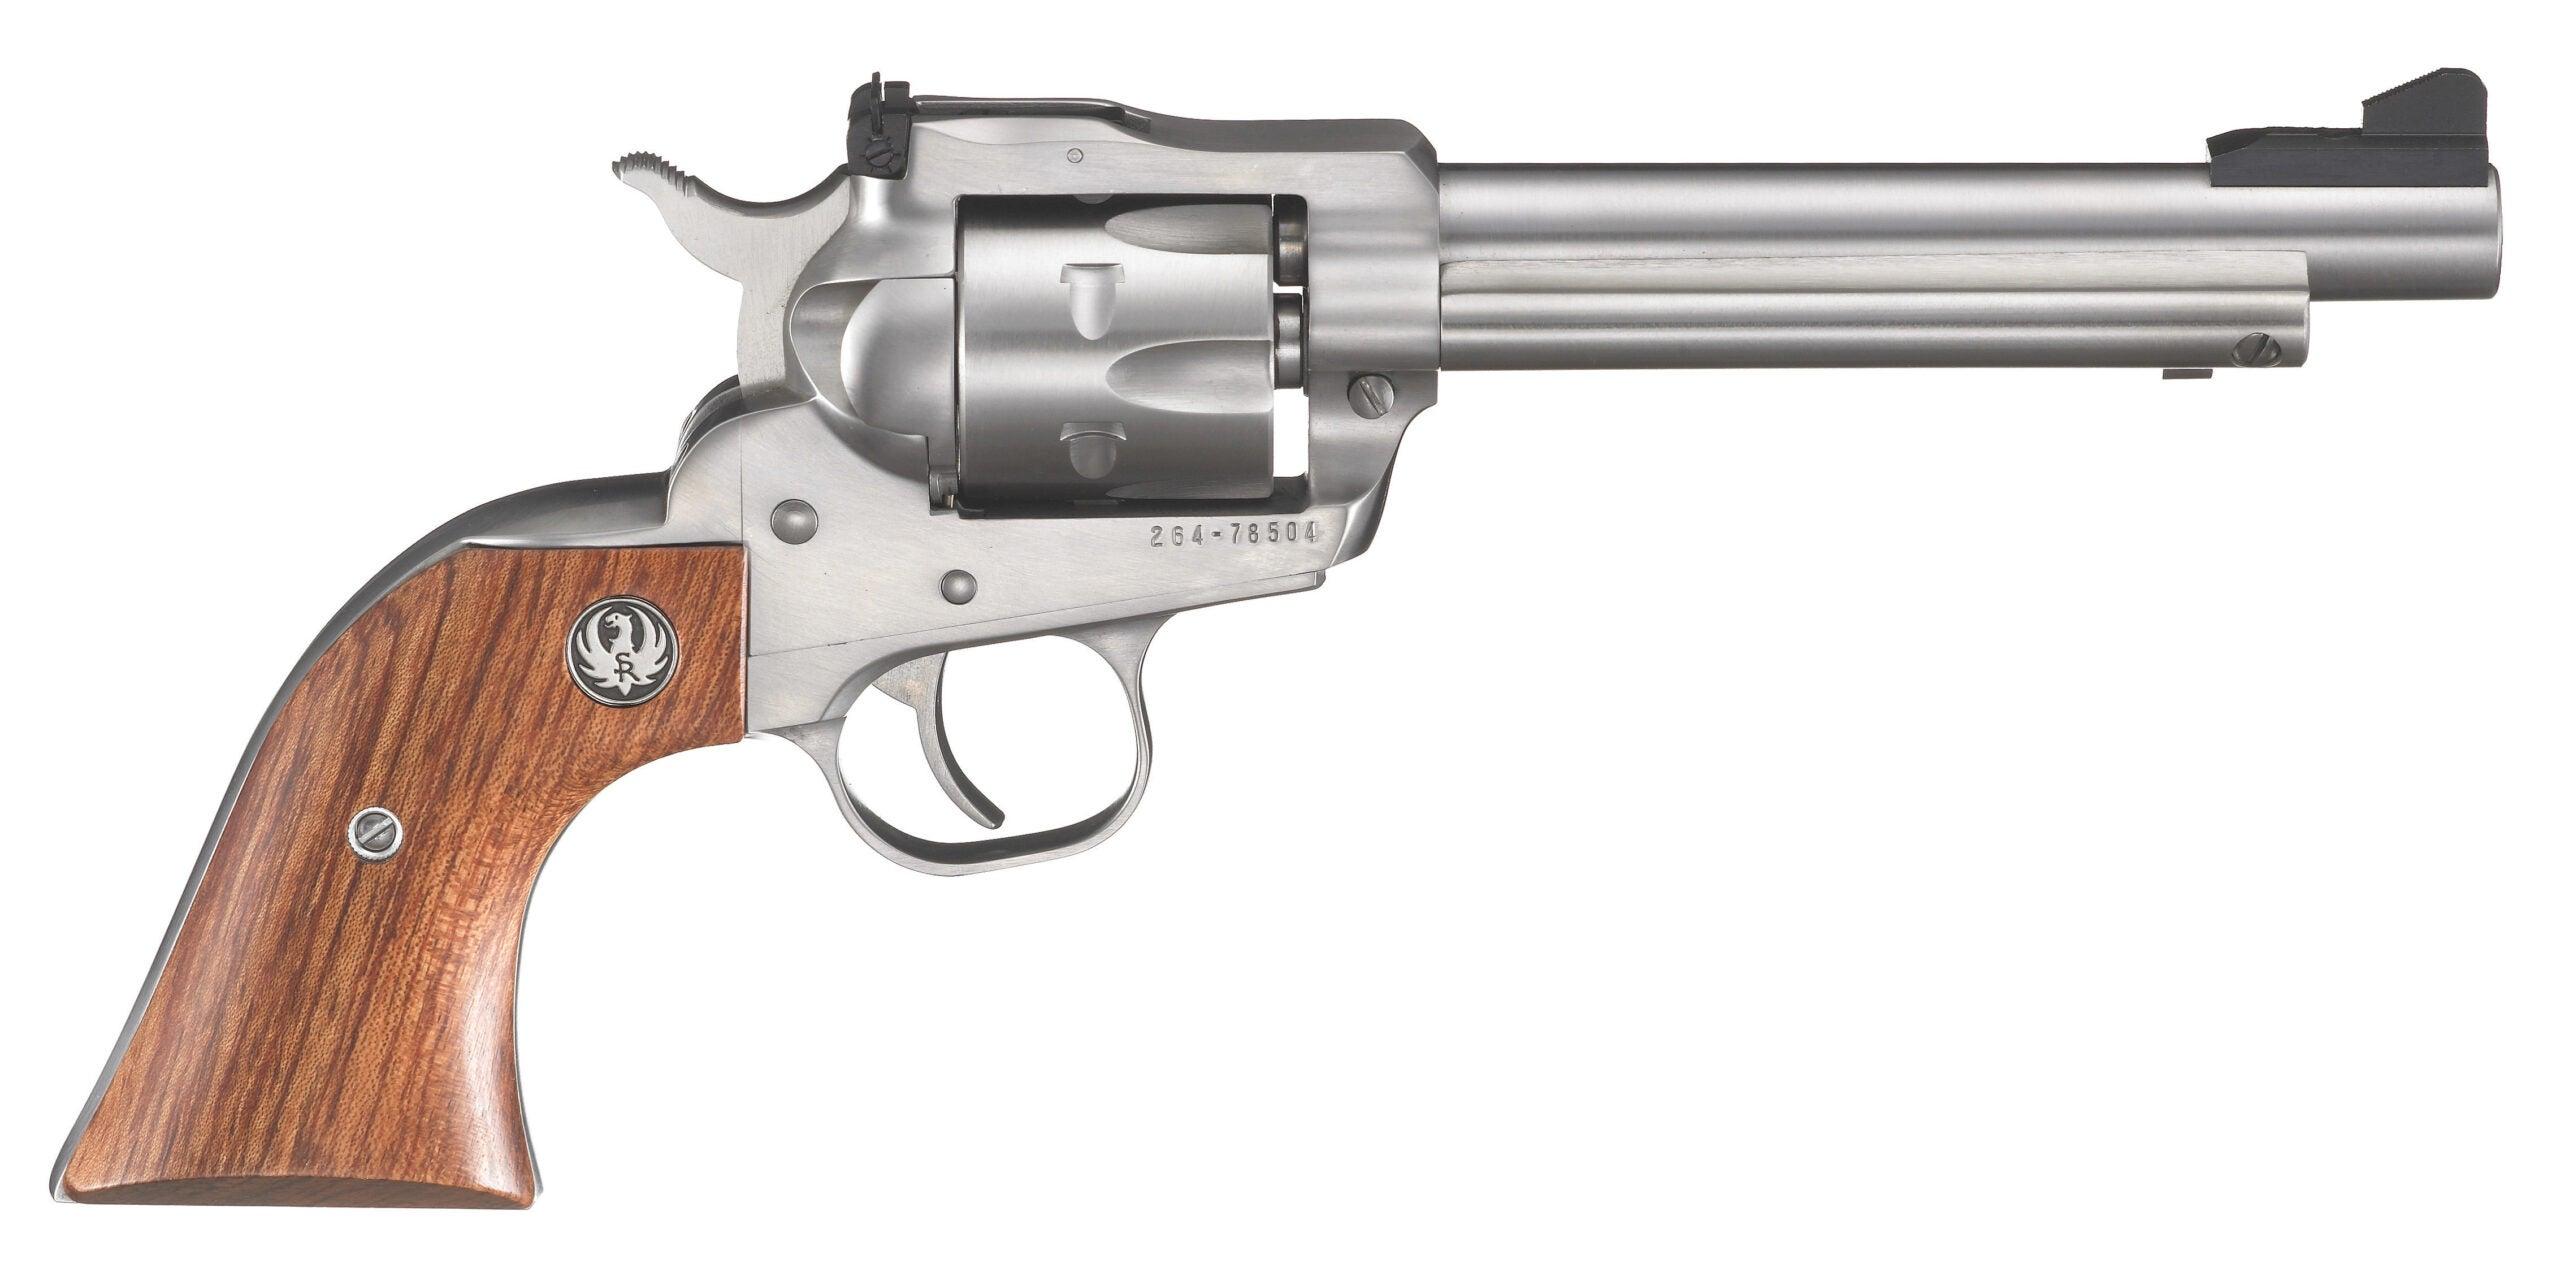 Ruger Single Six handgun